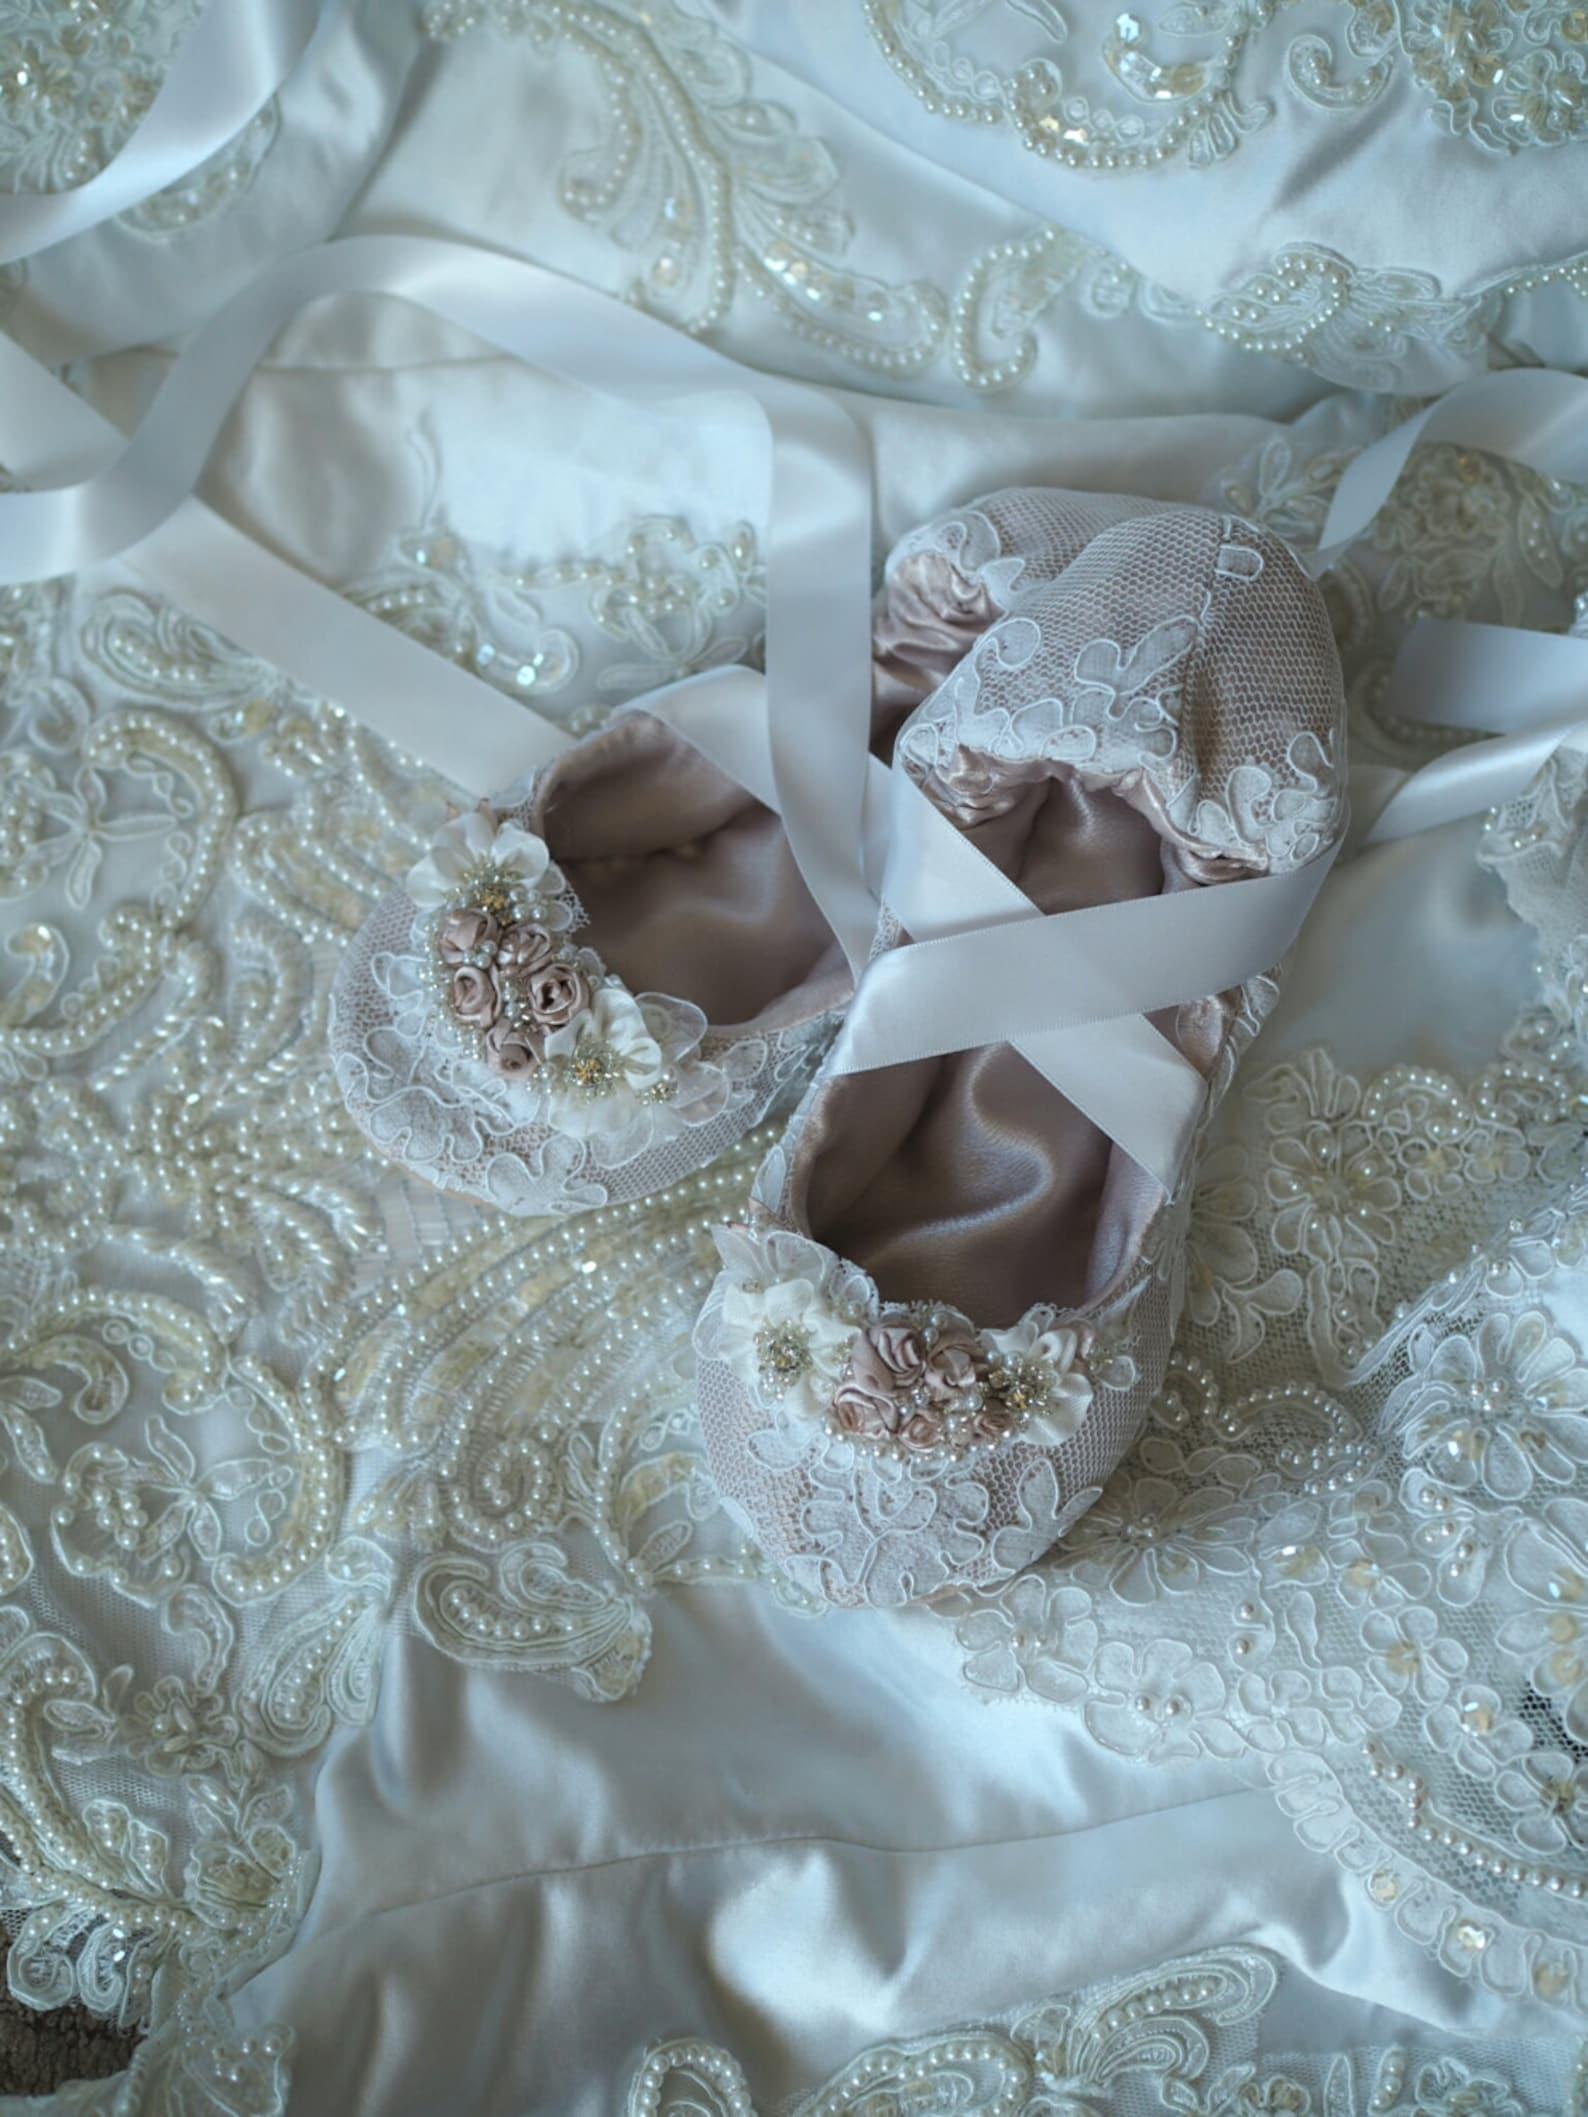 champagne princess ballerina bridal slipper with white lace, custom princess ballerina wedding slippers, beaded bridal ballet sl